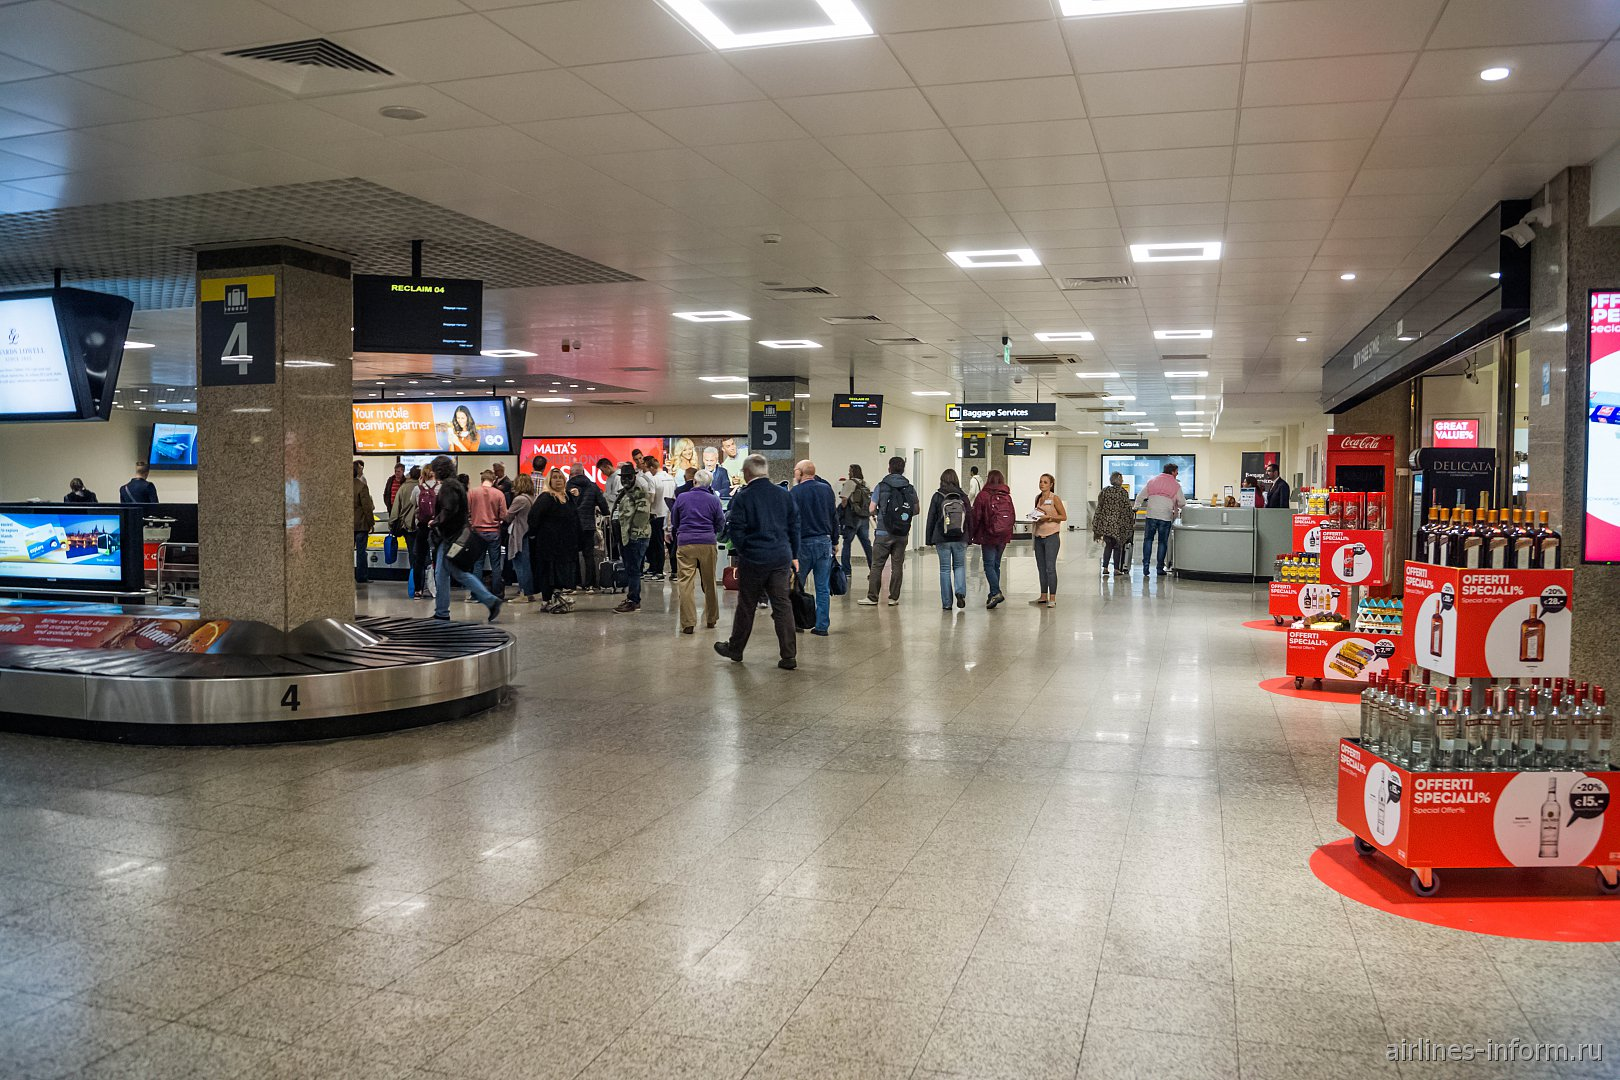 Зал выдачи багажа в аэропорту Мальта